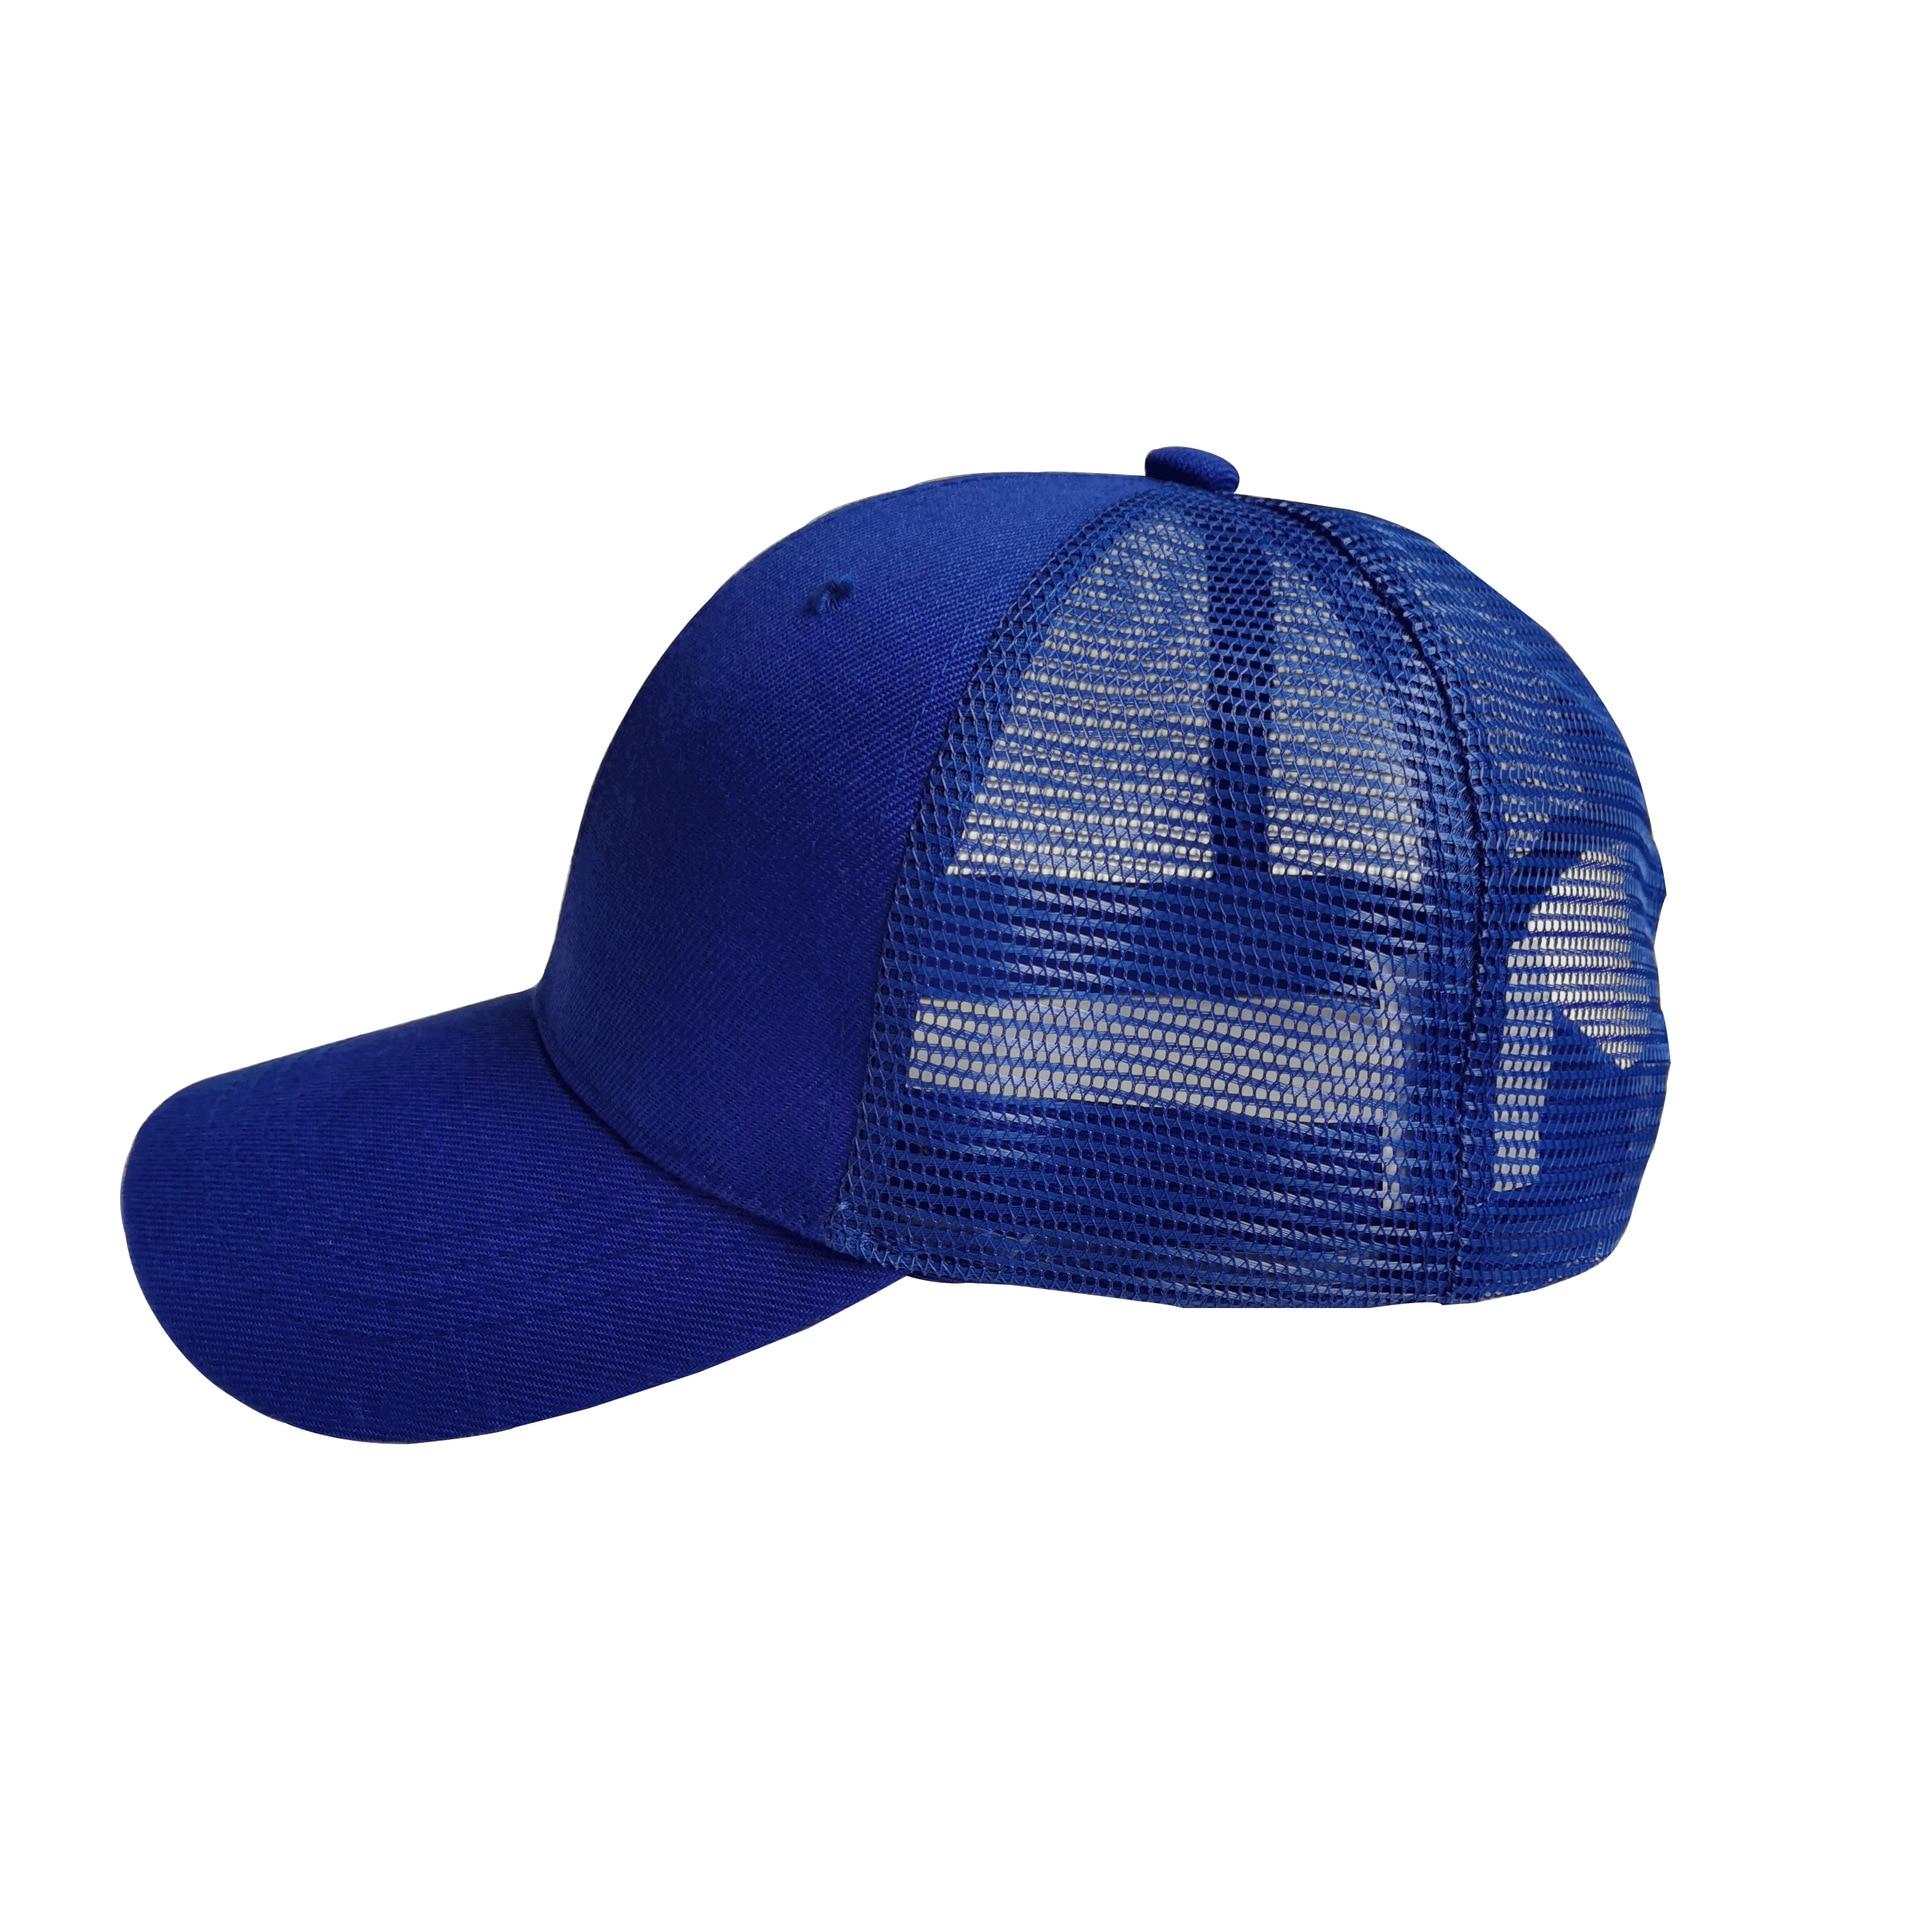 Summer Ladies Wild Breathable Sunshade Sunscreen Sun Hat